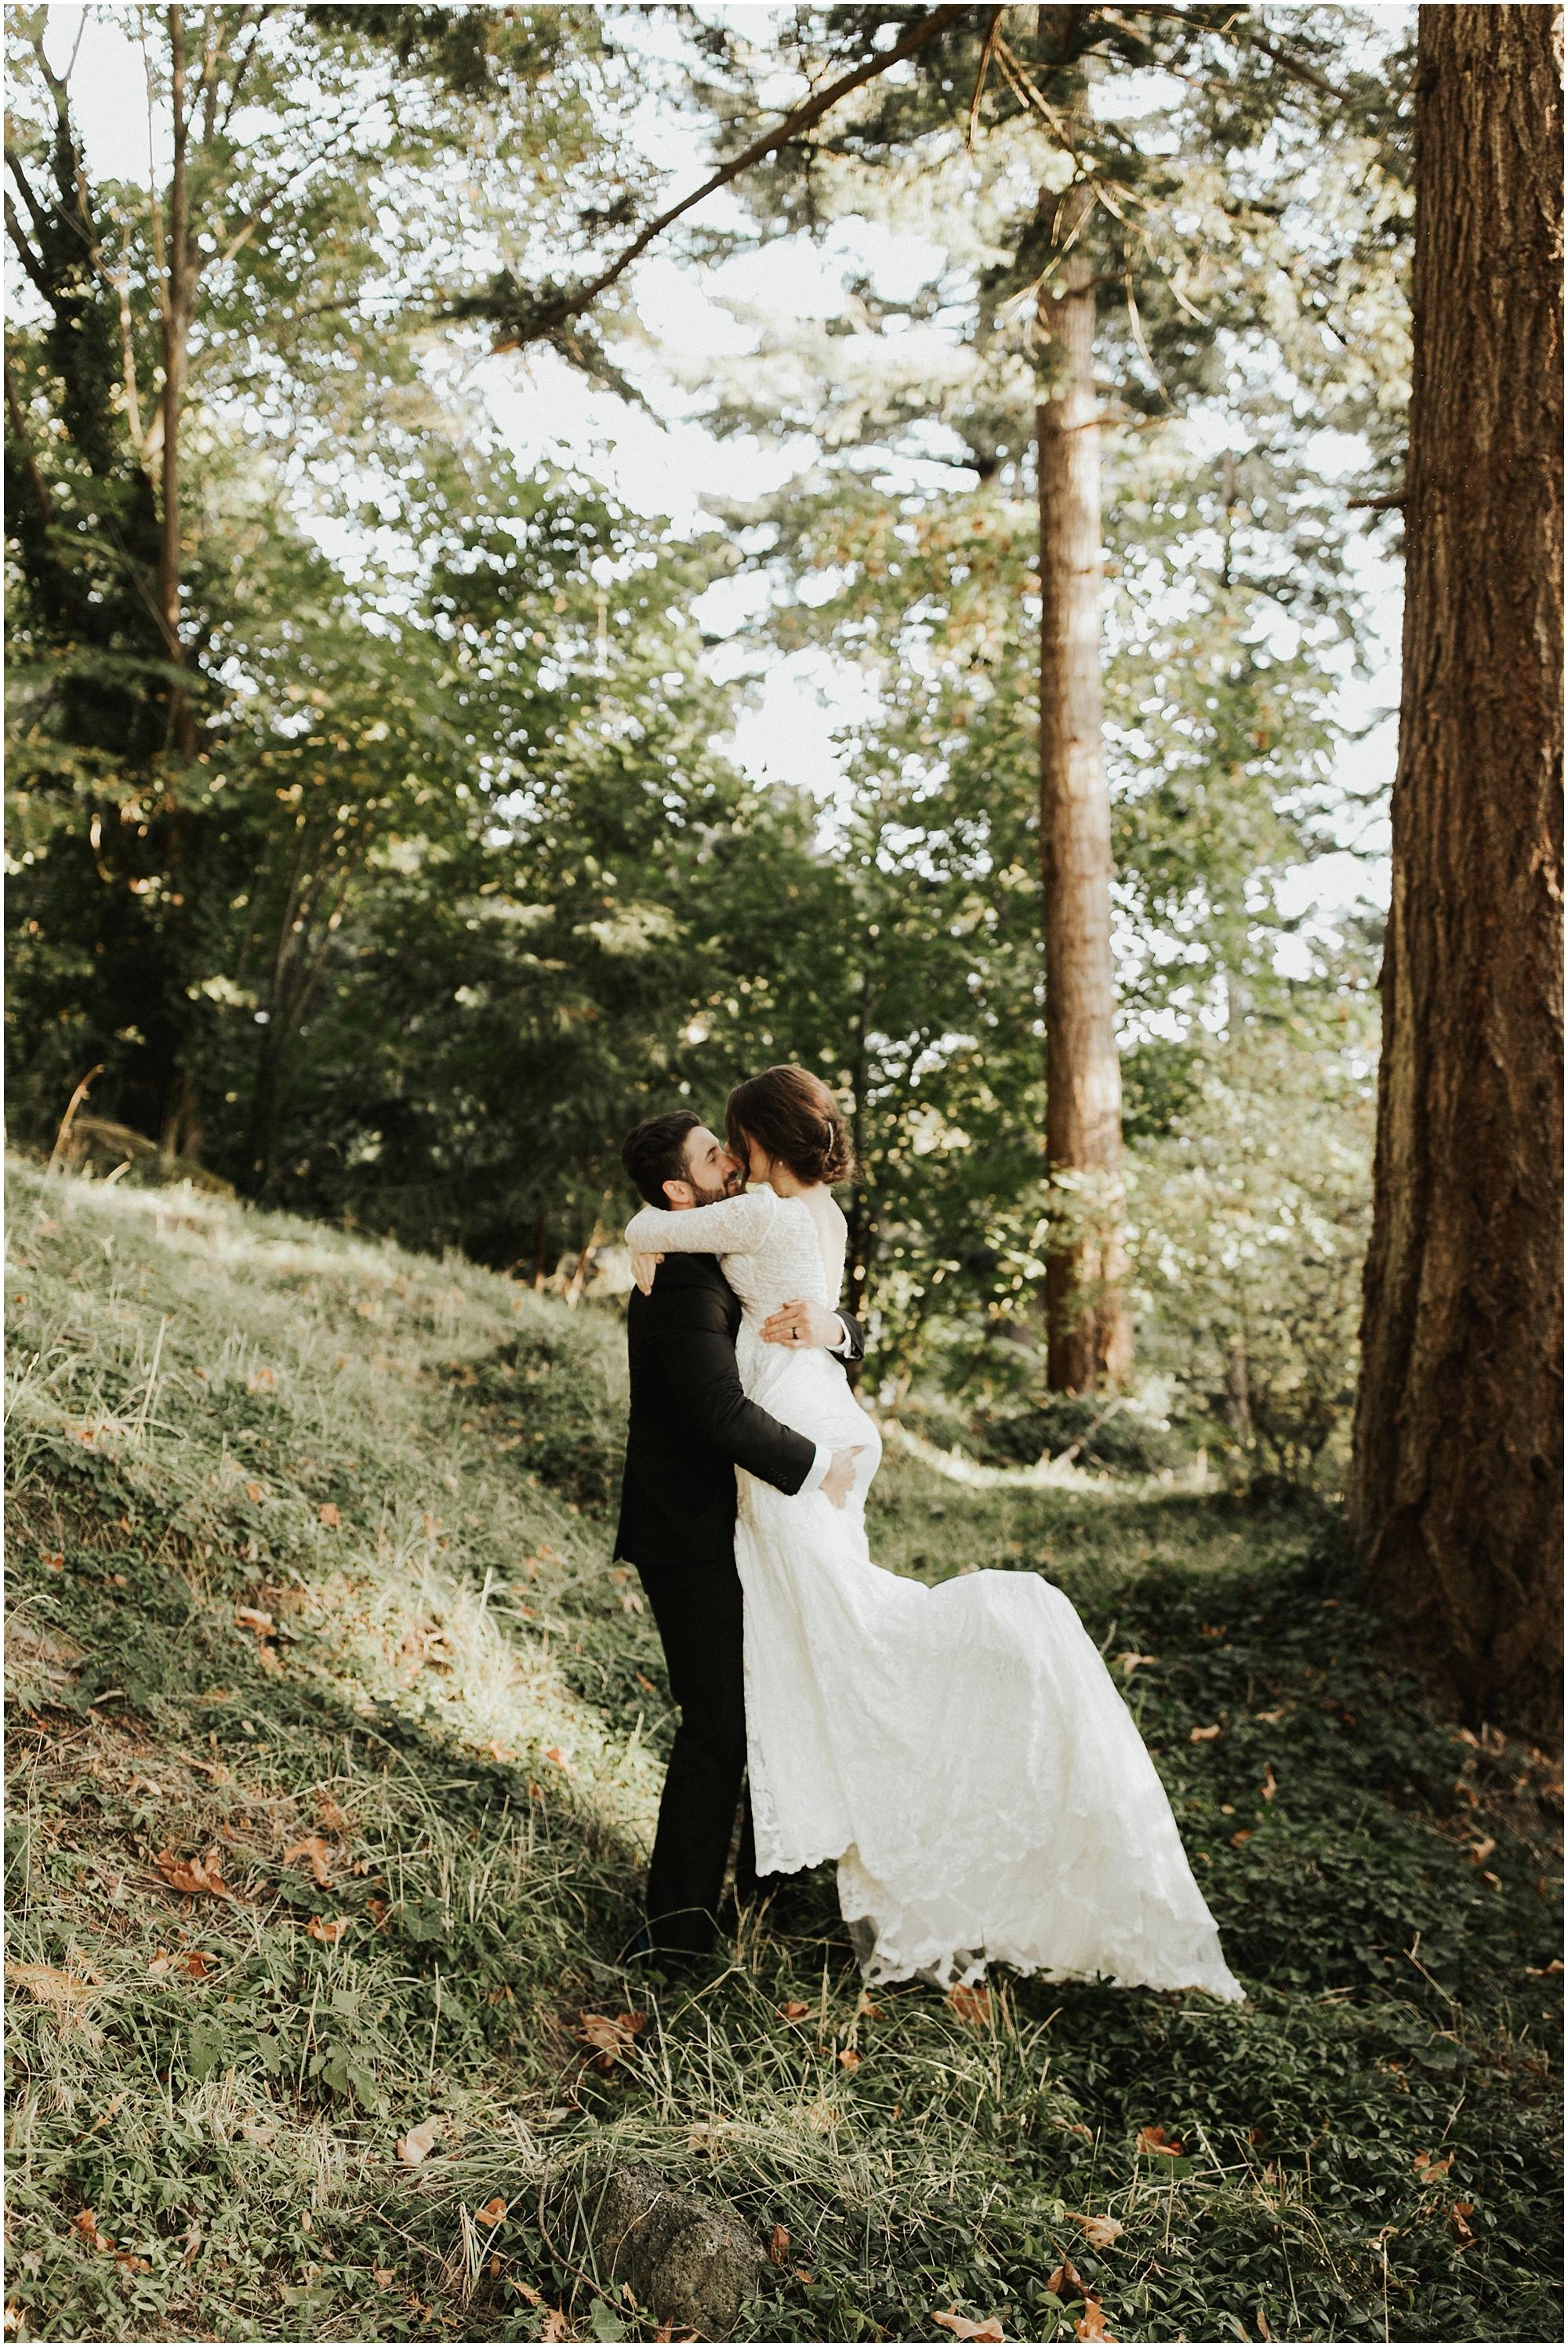 Lairmont Manor Wedding Bellingham Cassie Trottier Photo1091.jpg